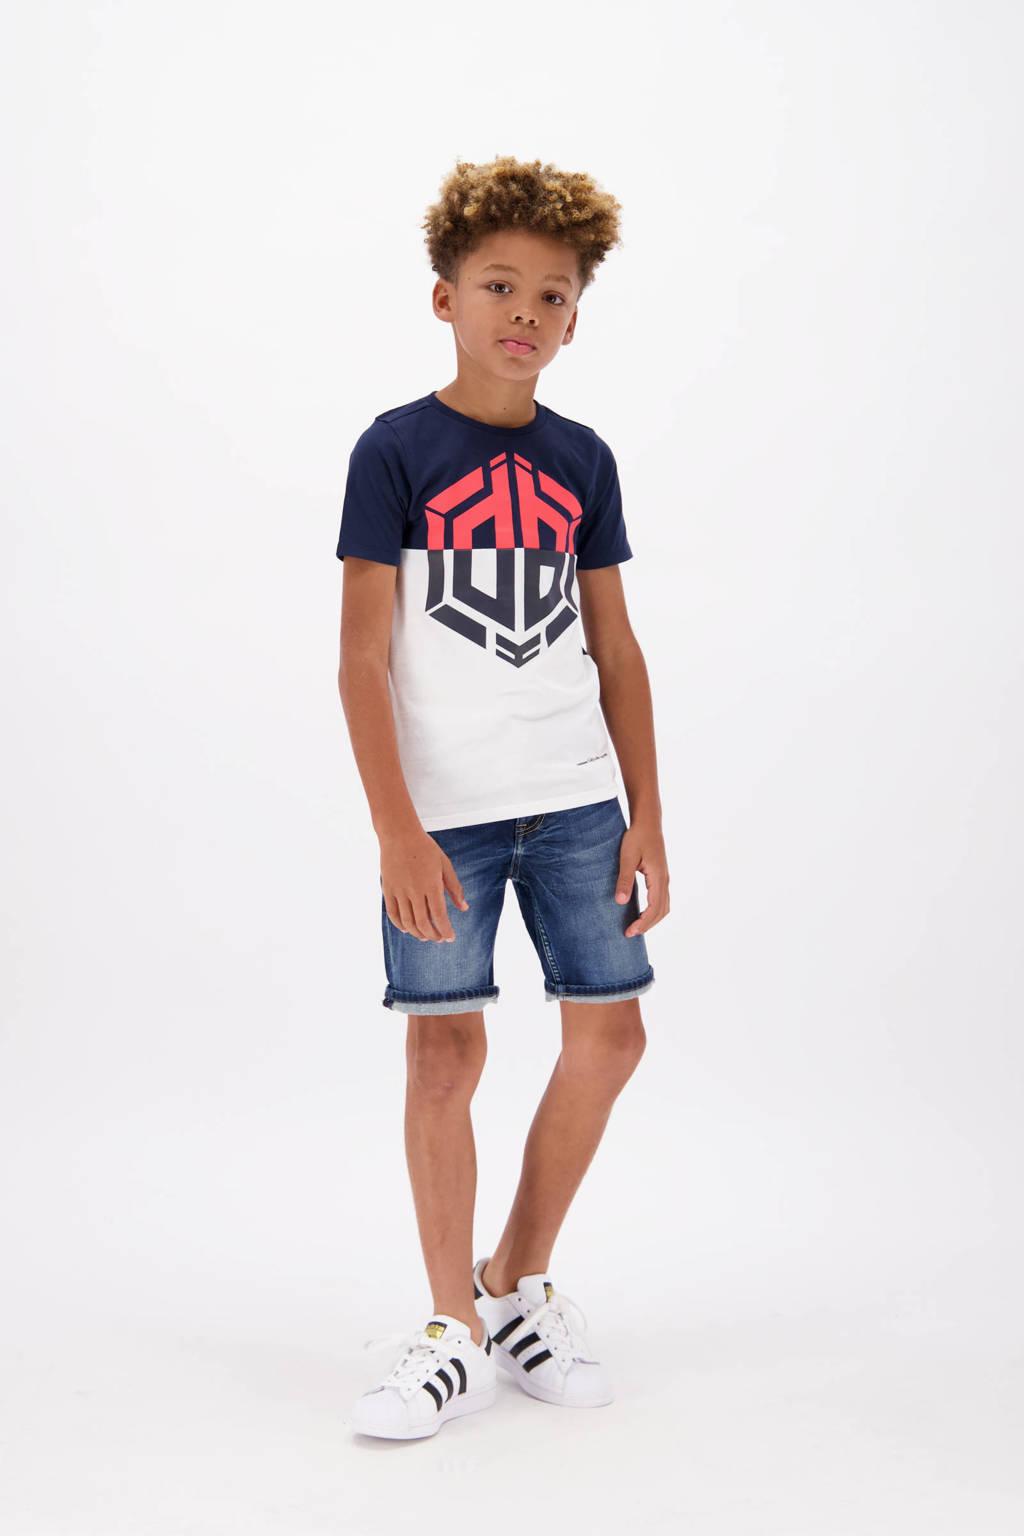 Vingino Daley Blind T-shirt Horres met logo donkrblauw/wit/rood, Donkrblauw/wit/rood